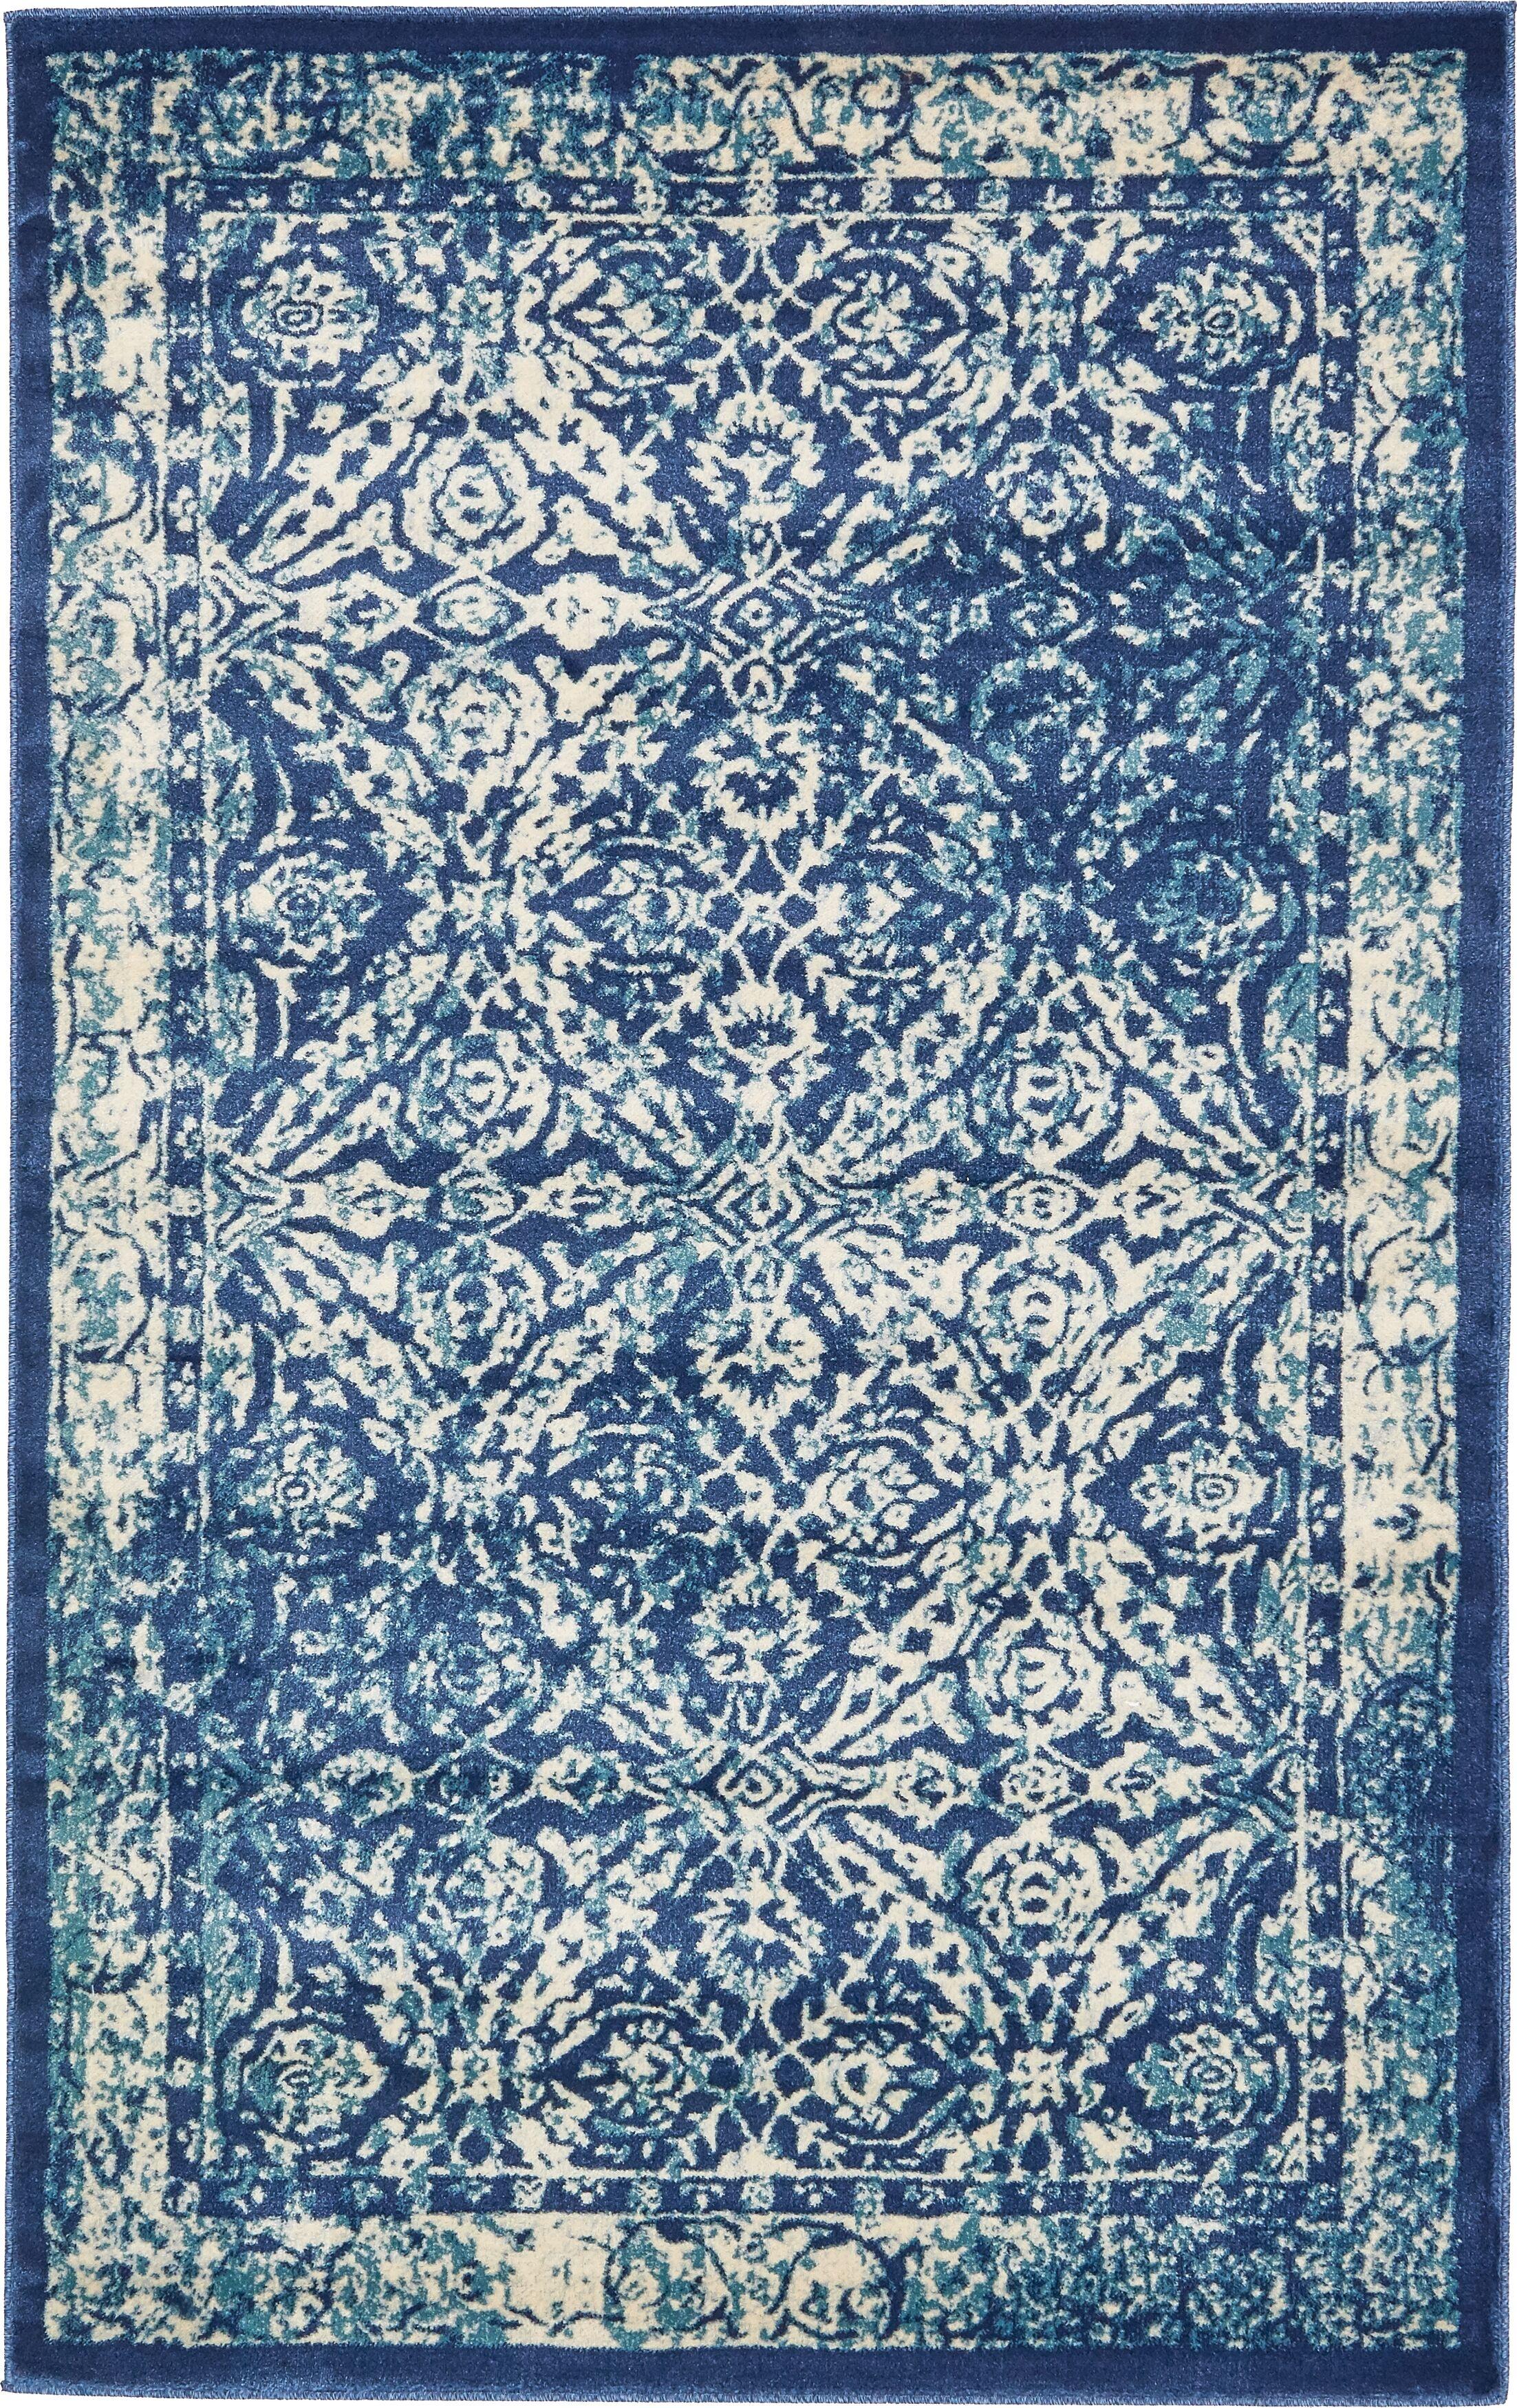 Jae Blue Indoor Area Rug Rug Size: Rectangle 5' x 8'